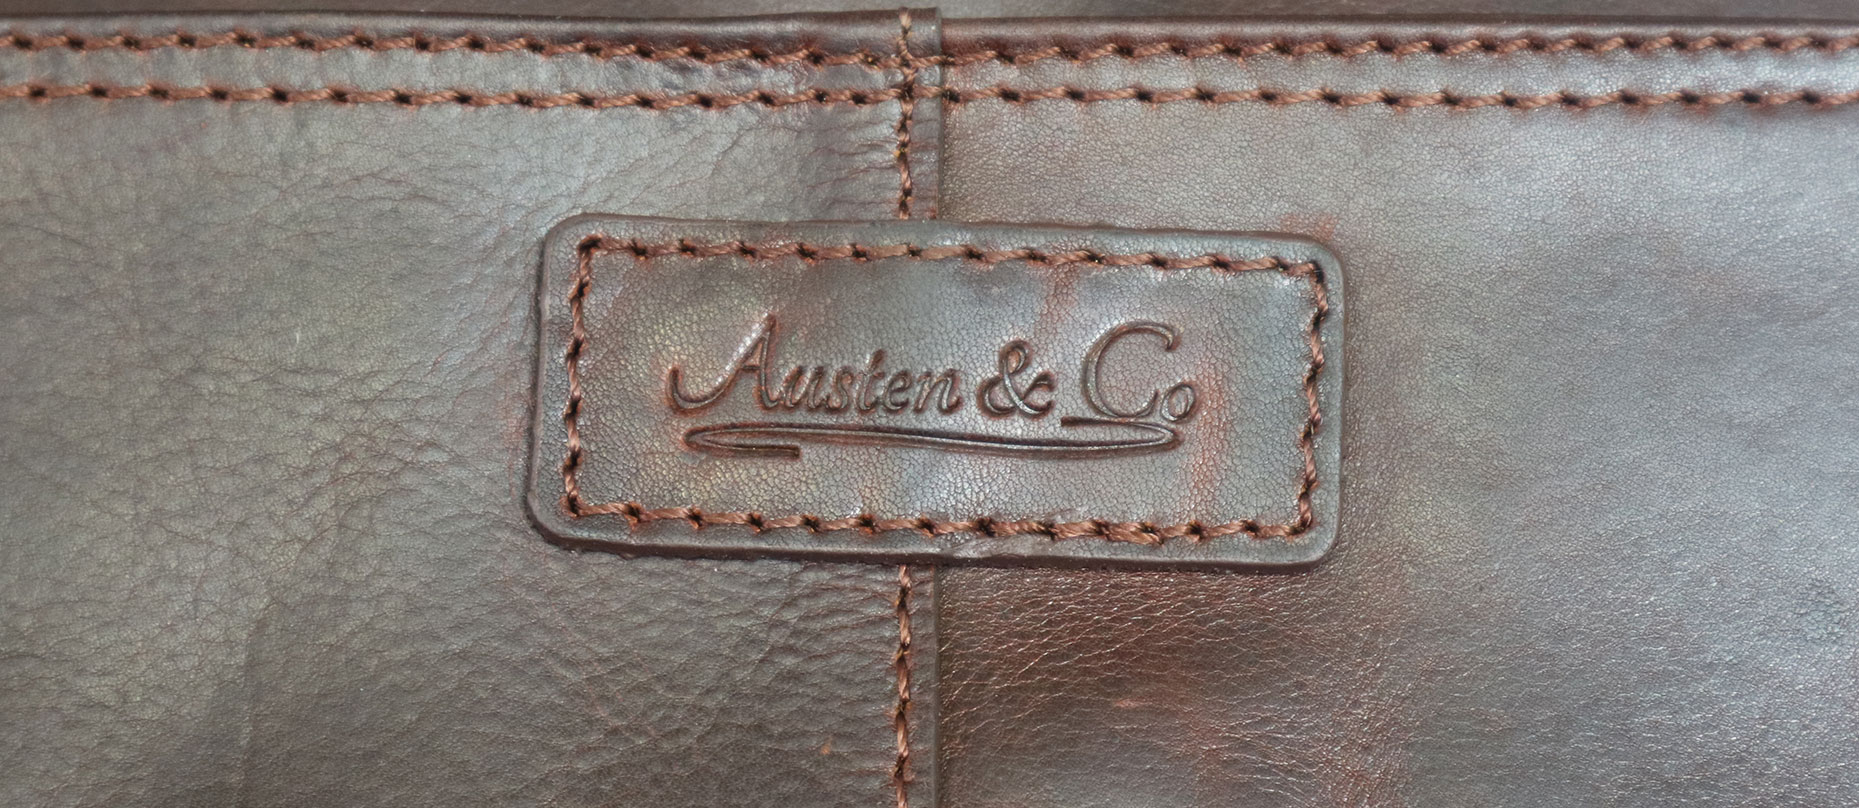 Brown Briefcase Austen & Co Logo